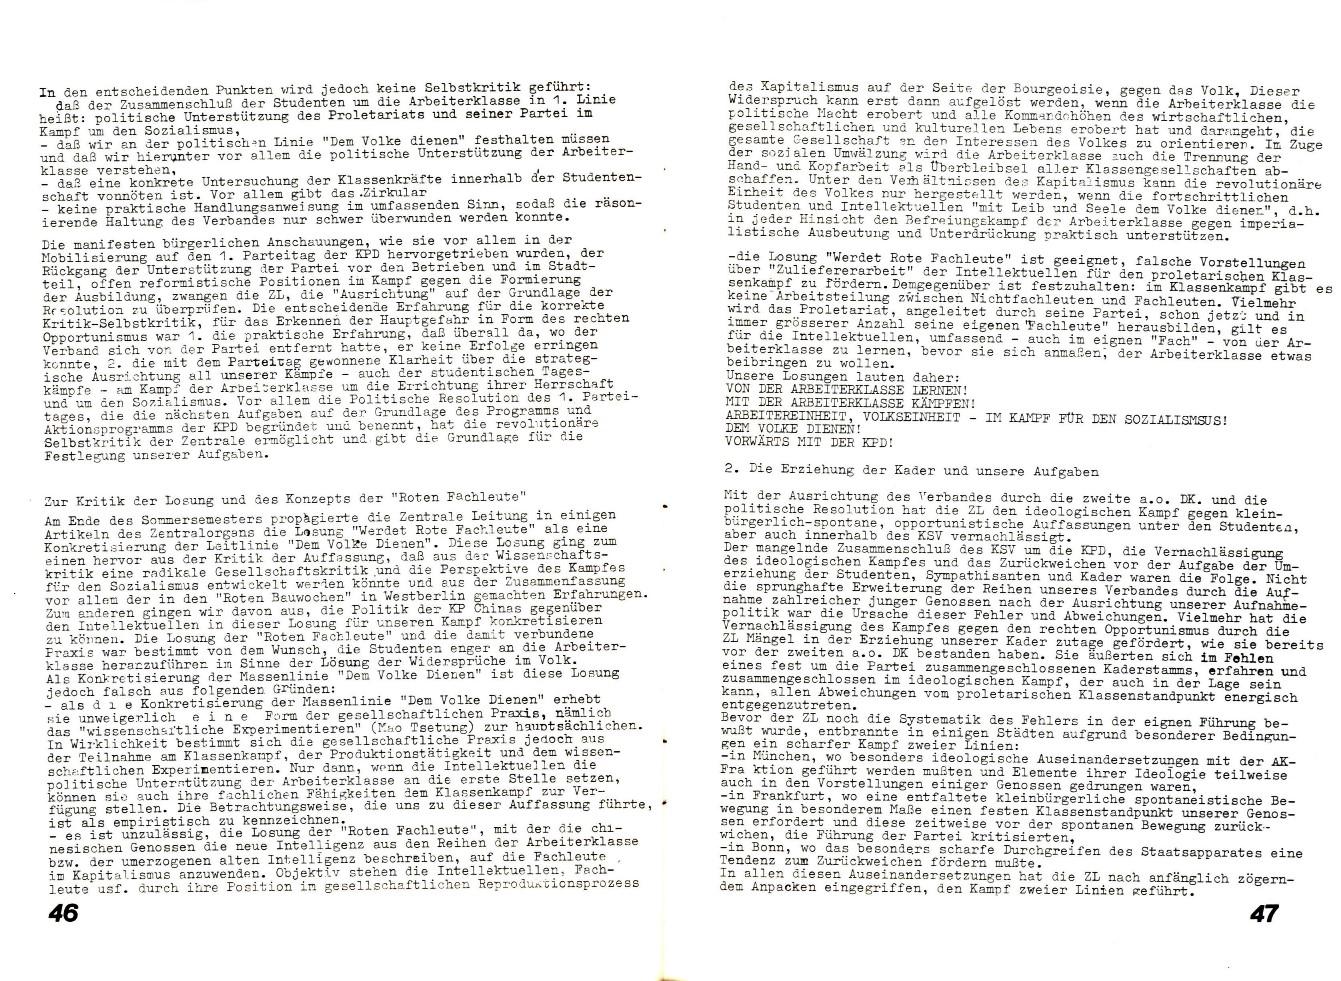 KSV_1974_Rechenschaftsbericht_25